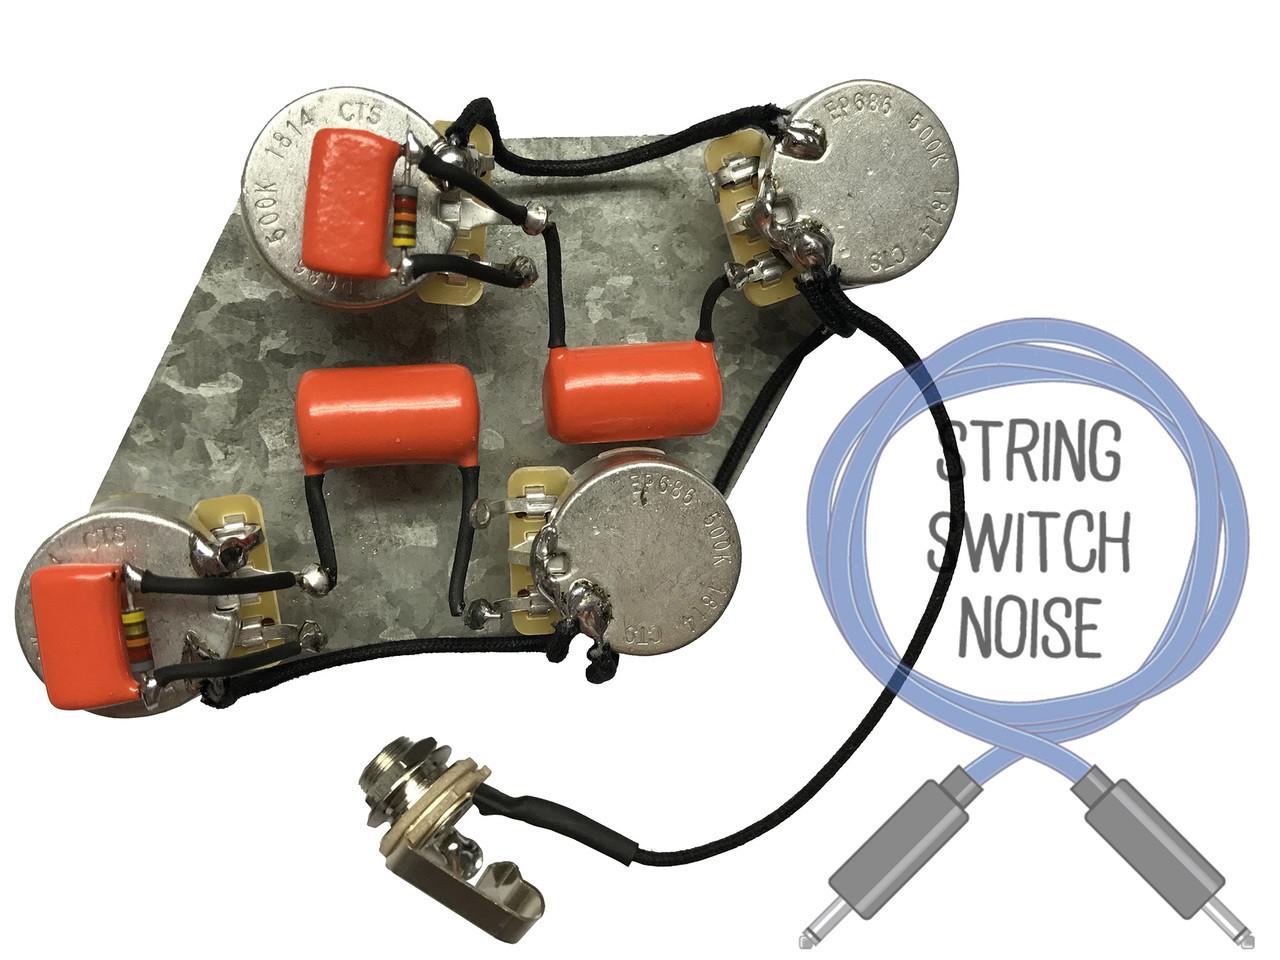 gibson les paul long shaft pots wiring harness treble bleed wiring gibson les paul wiring guitar treble bleed wiring gibson les [ 1280 x 960 Pixel ]